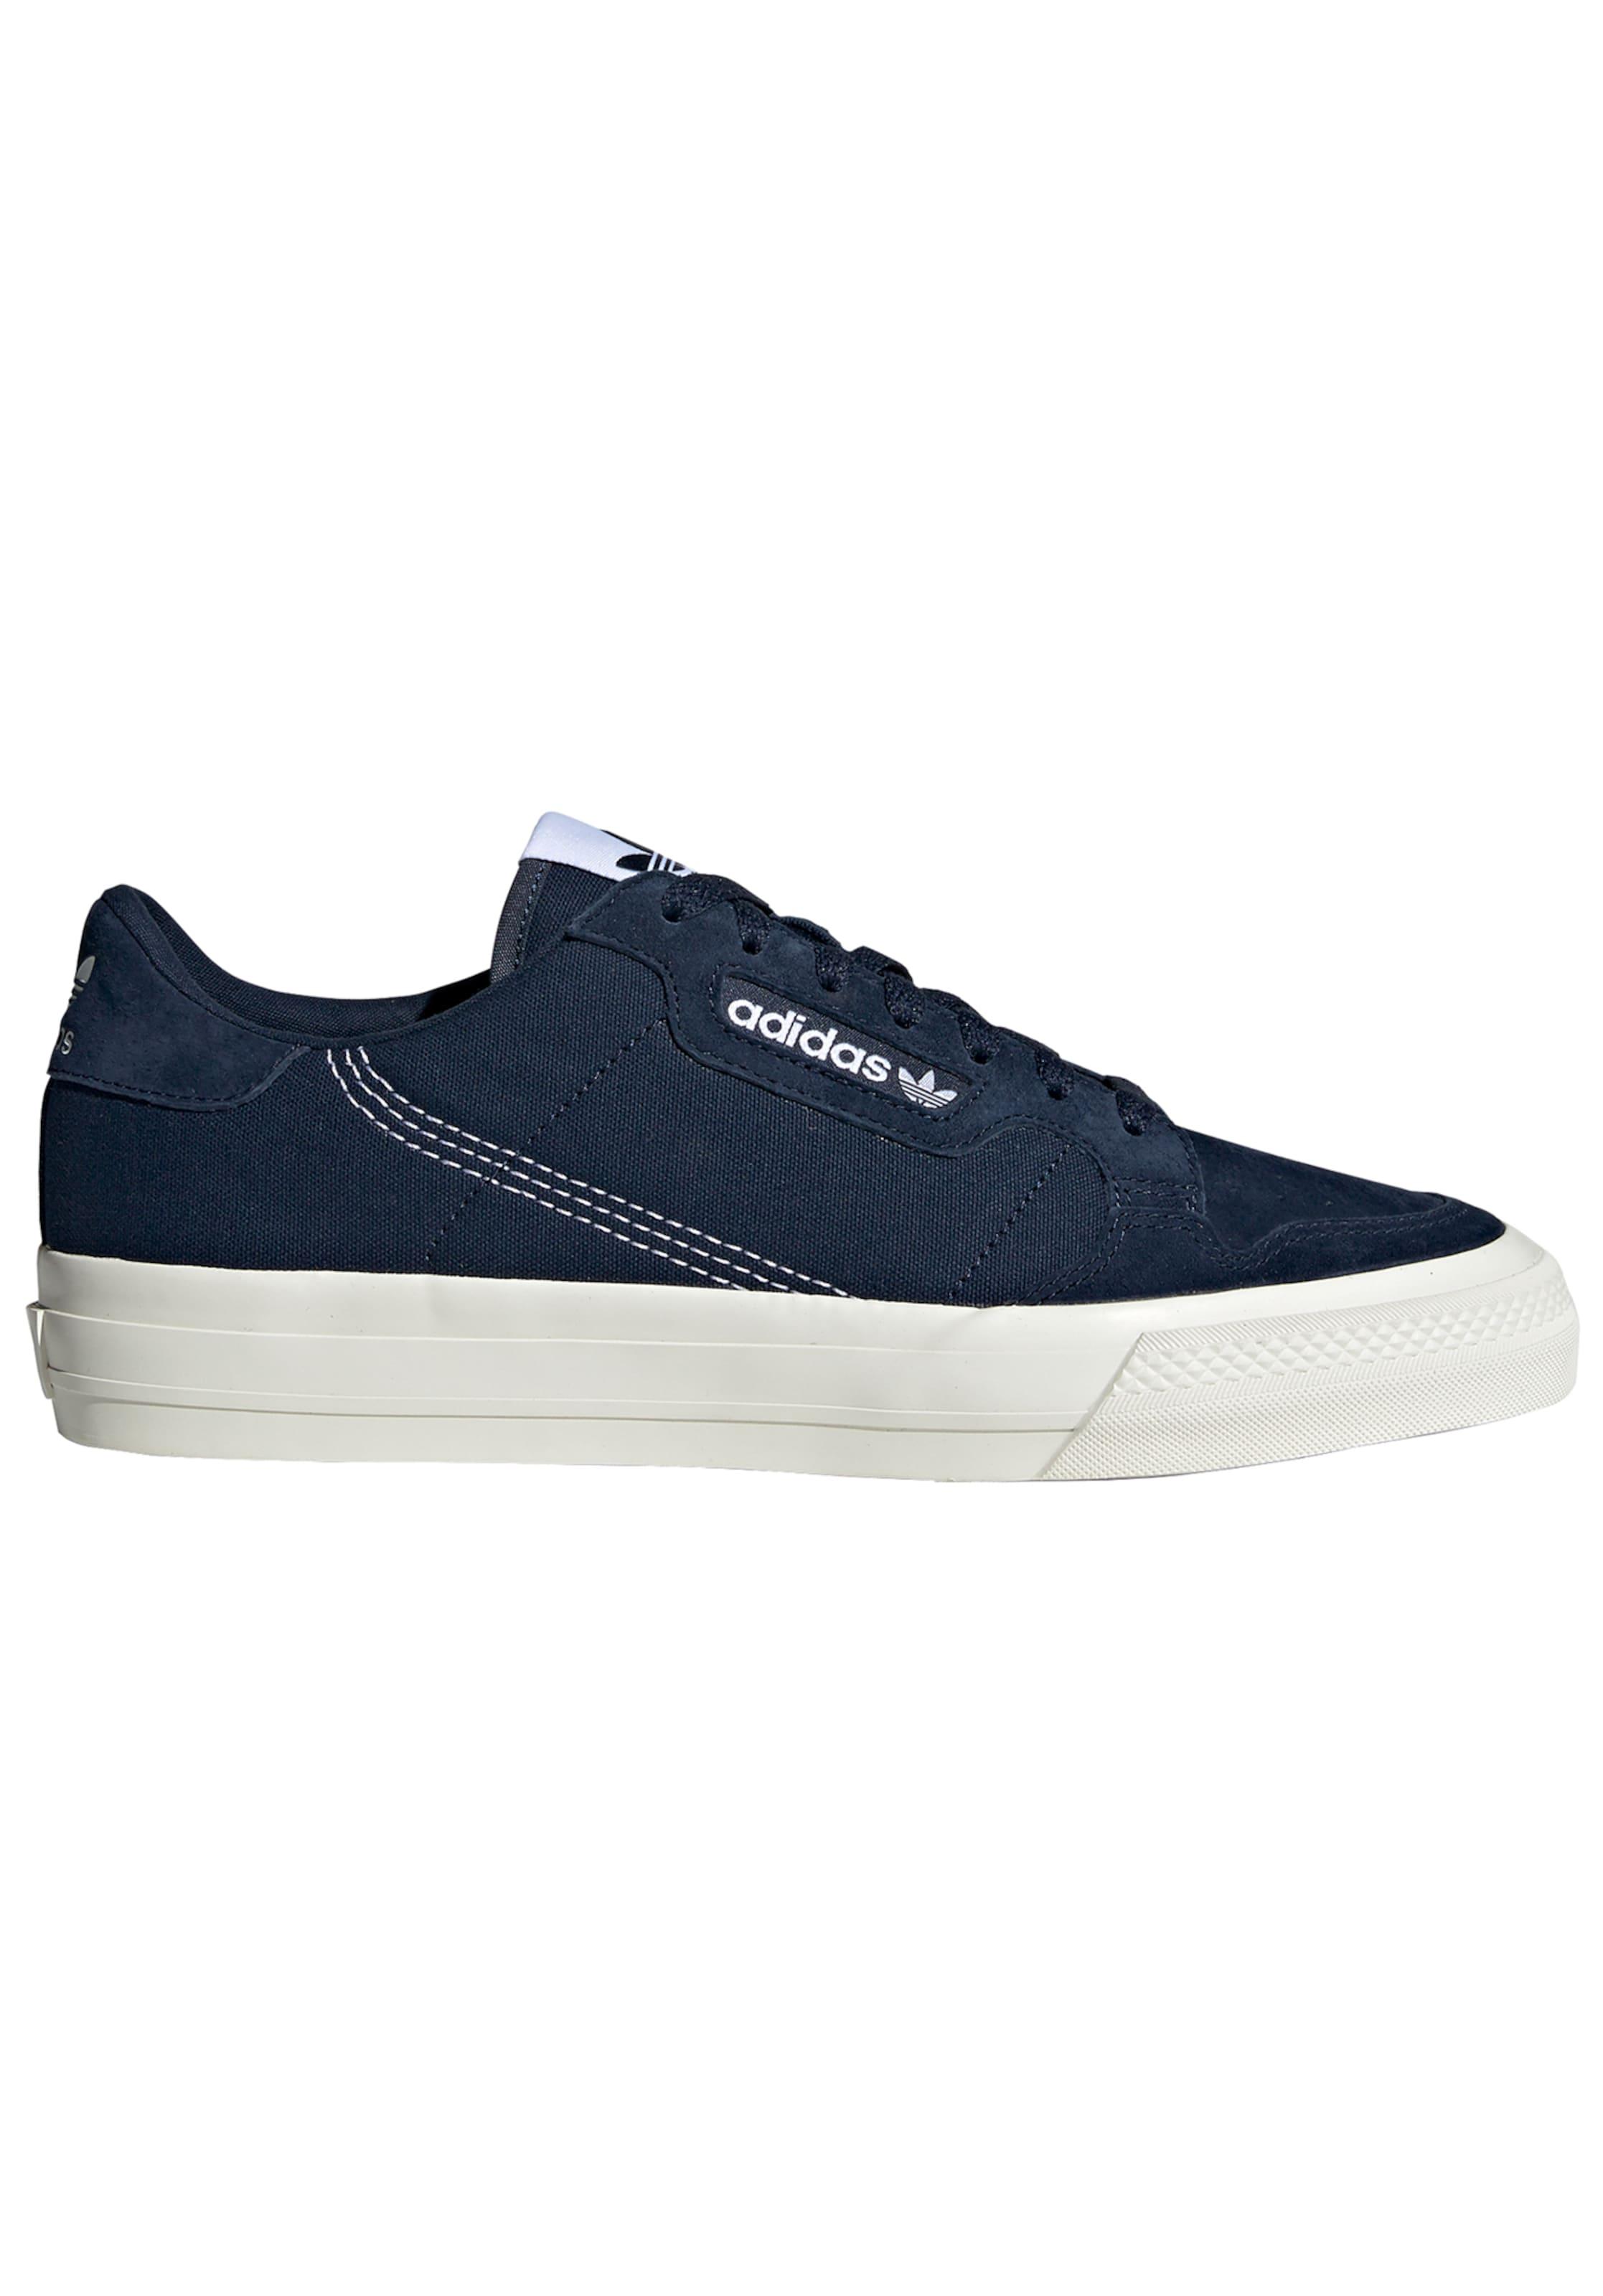 Vulc' En Basses 'continental MarineBlanc Originals Adidas Baskets Bleu E9e2WDIYH